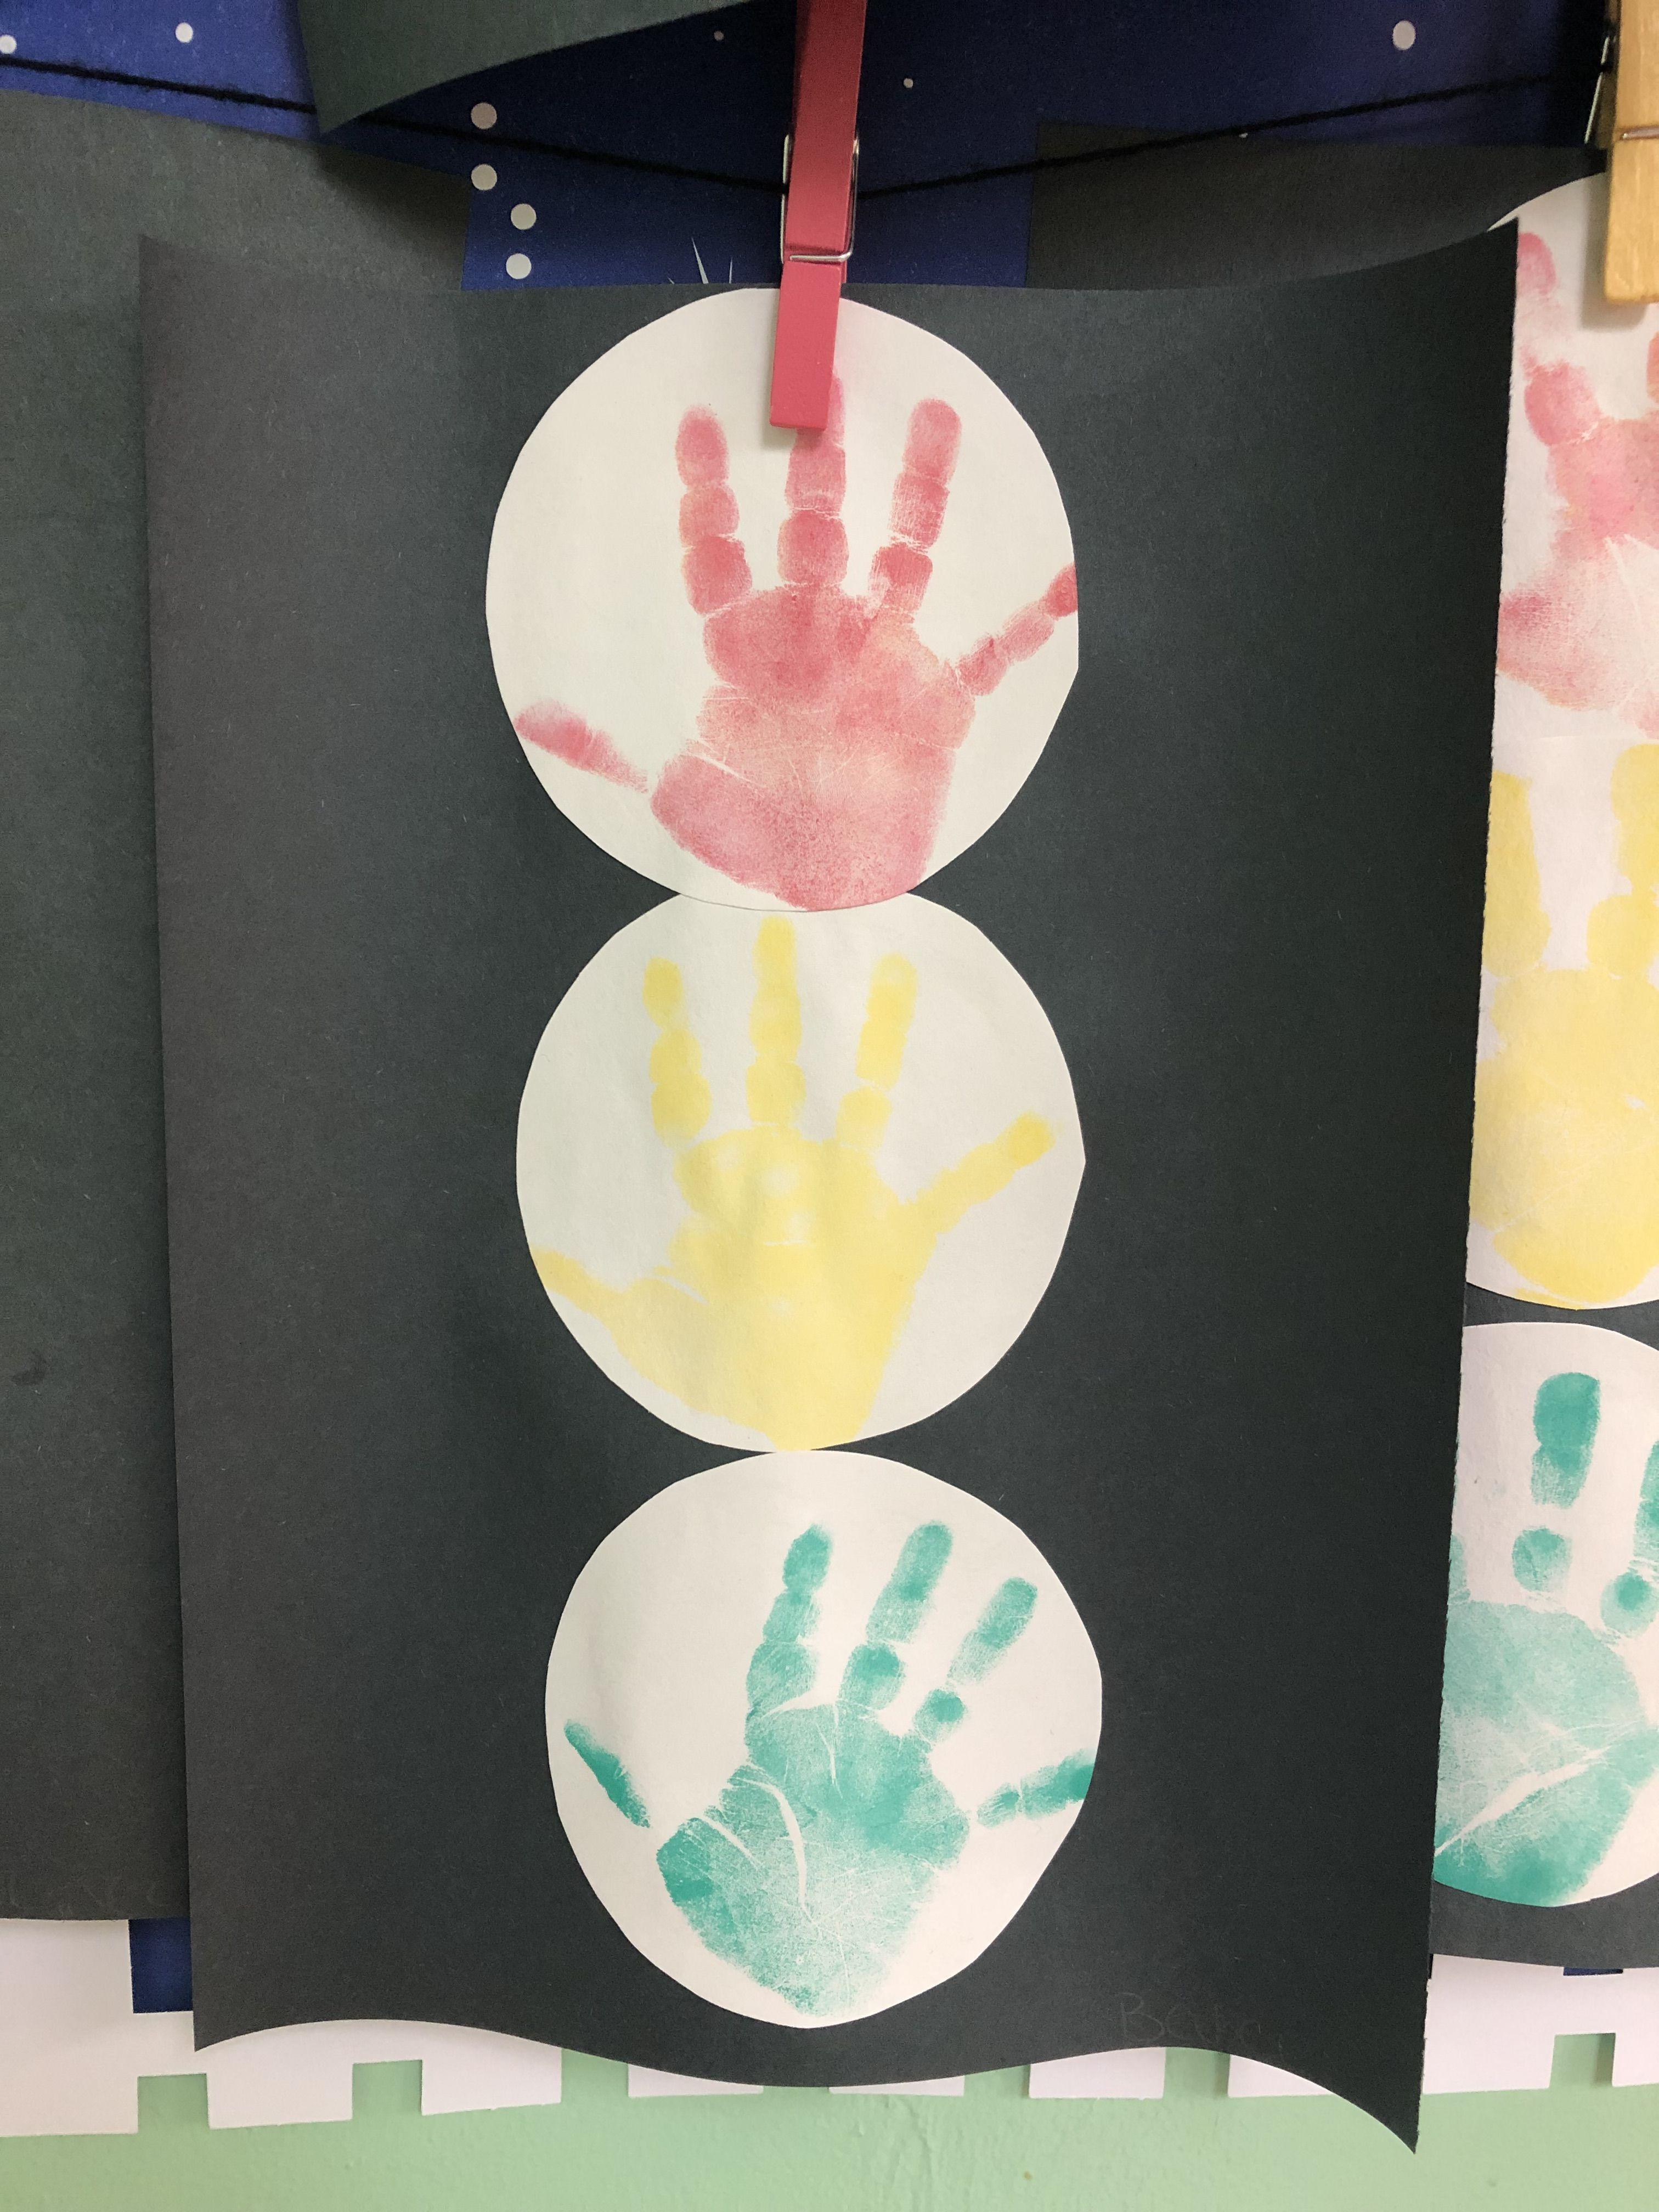 Stop Light With Handprint